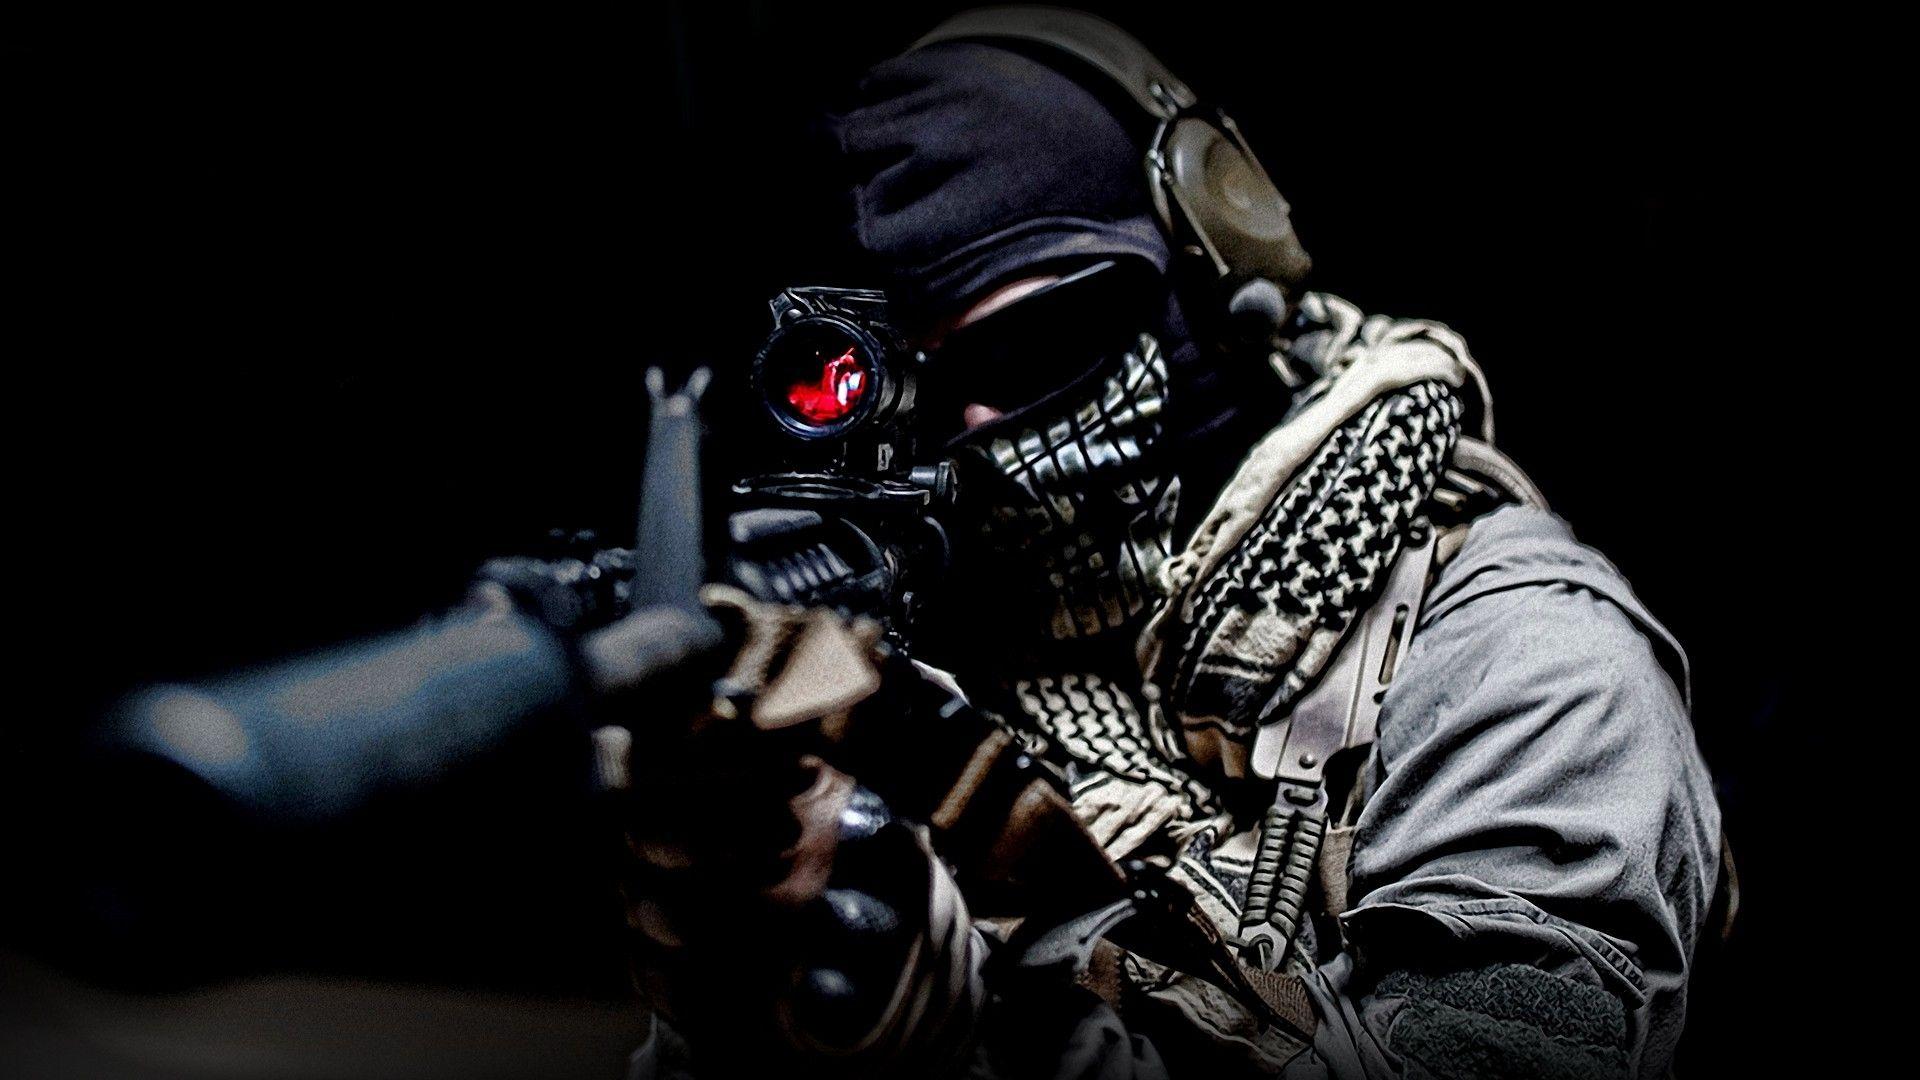 Call Of Duty Modern Warfare Game Wallpaper Cod Callofduty Call Of Duty Ghosts Call Of Duty Call Of Duty Black